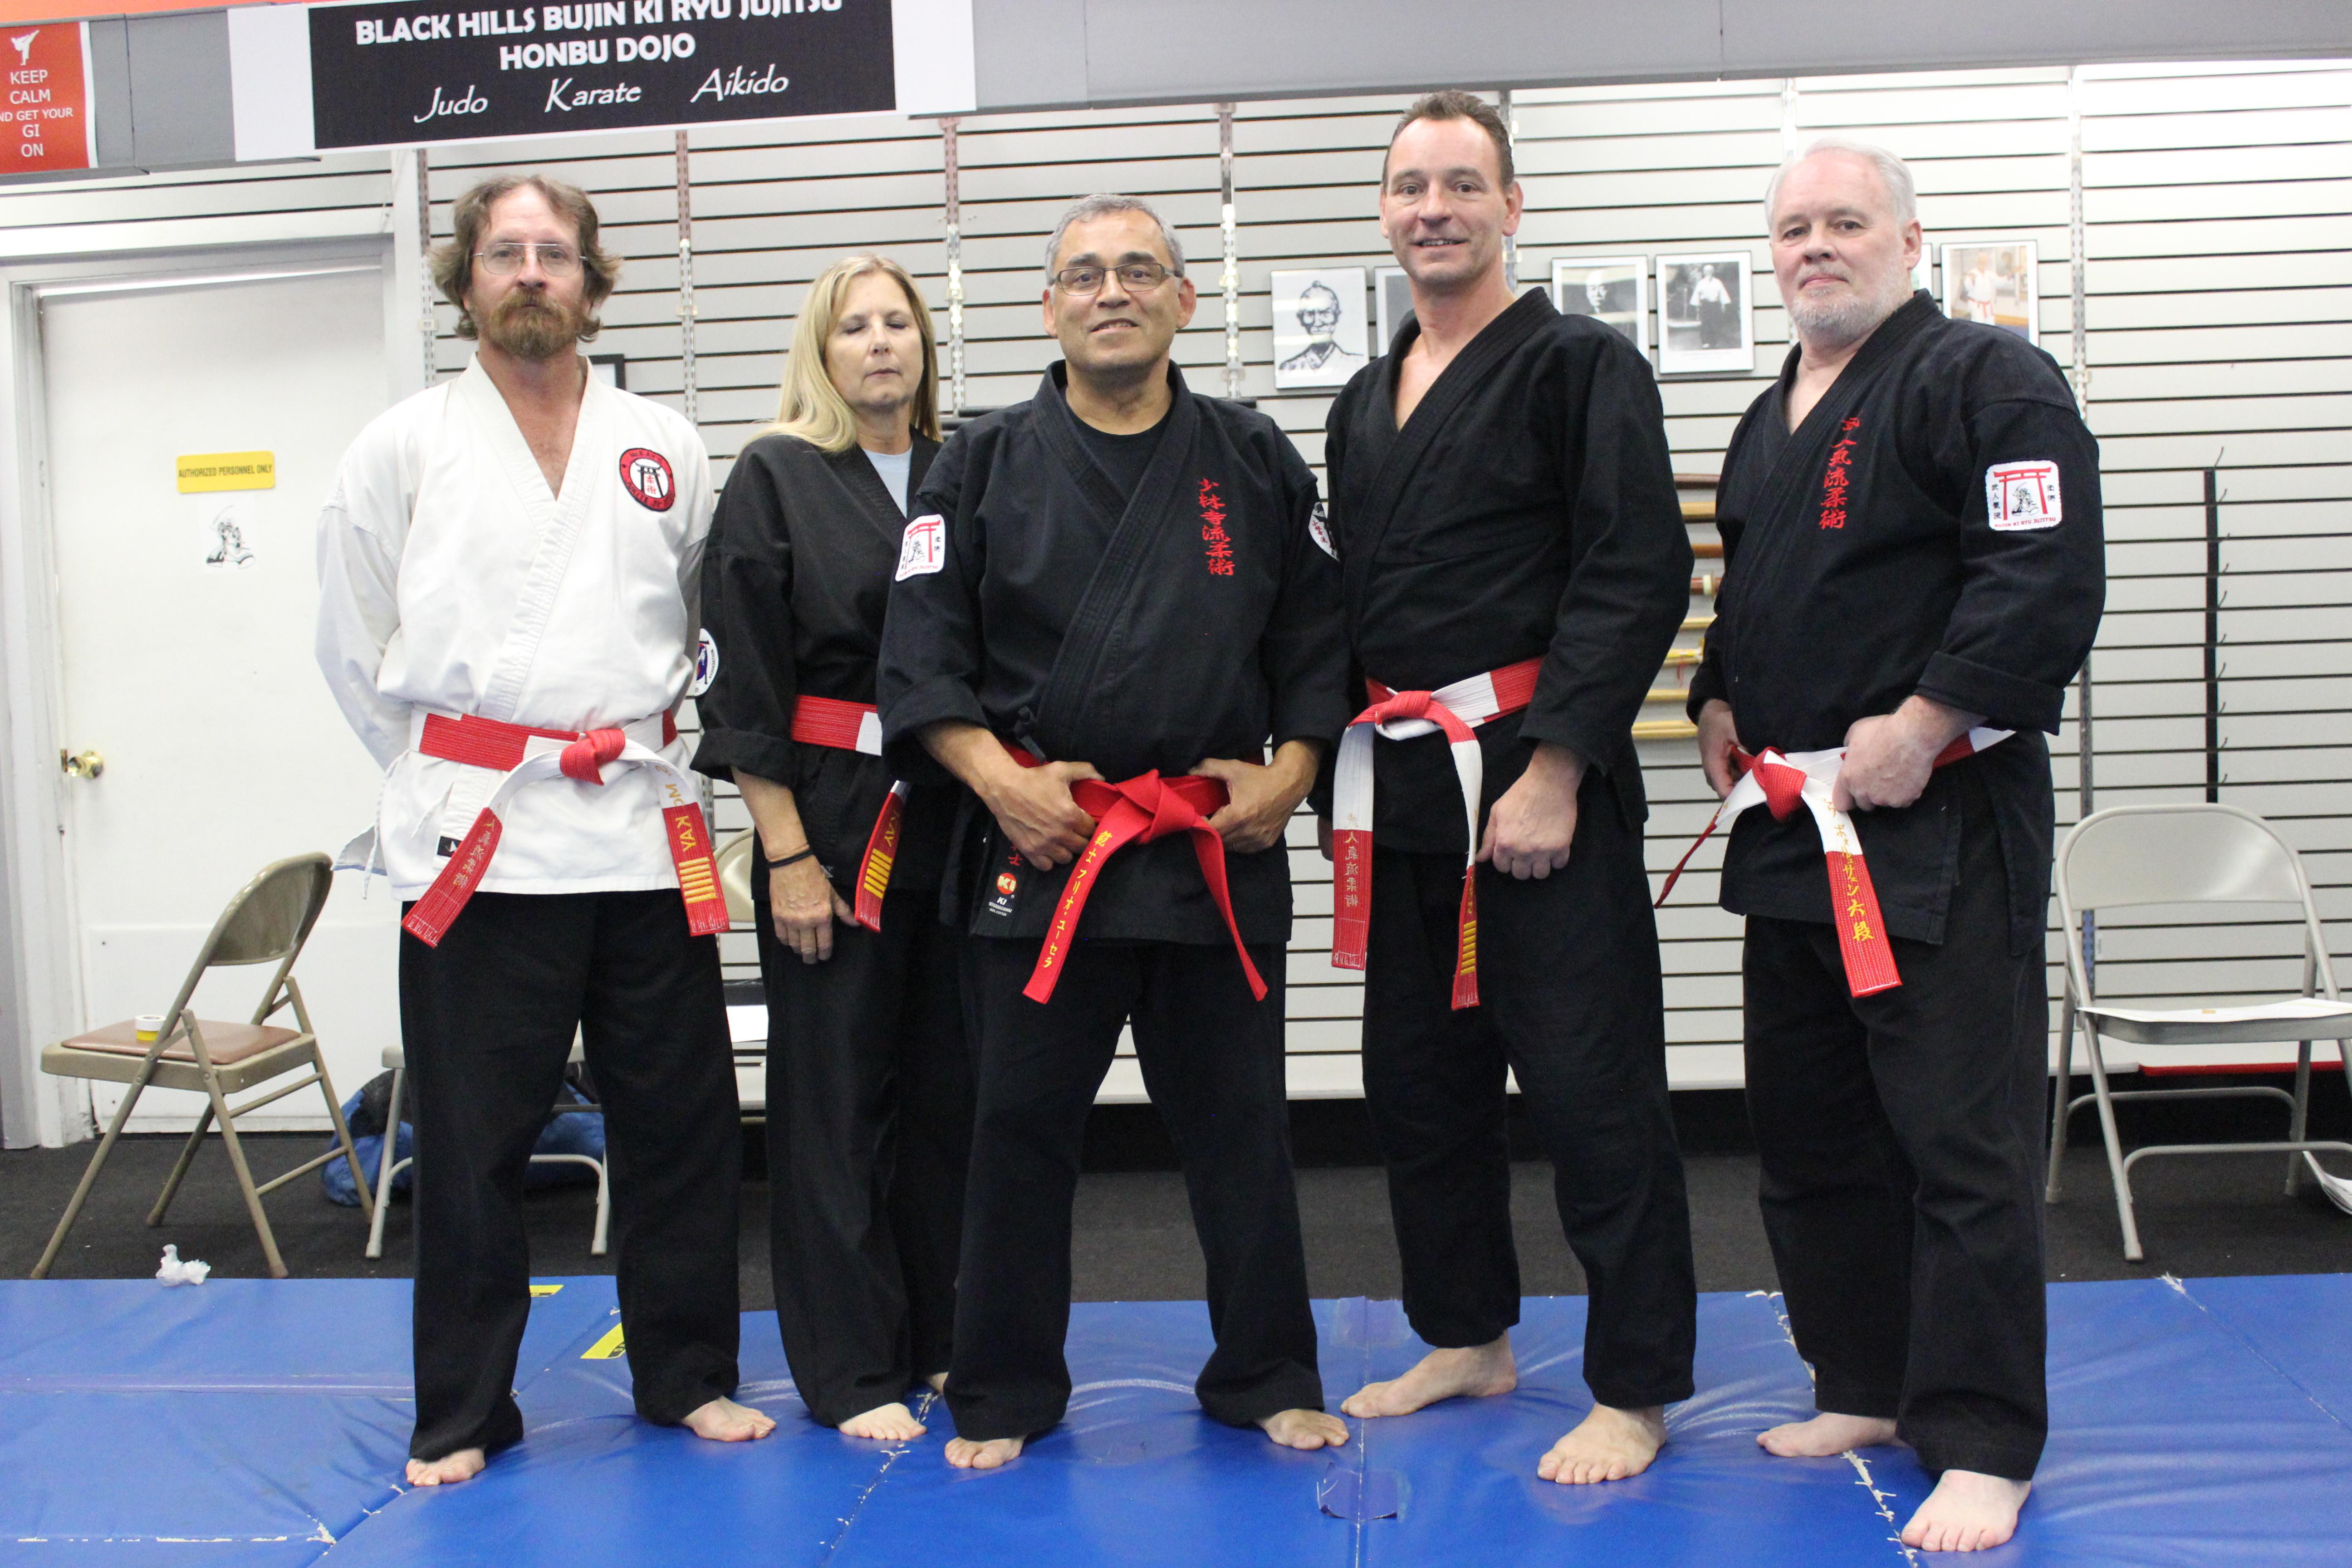 Master Instructors of Jujitsu